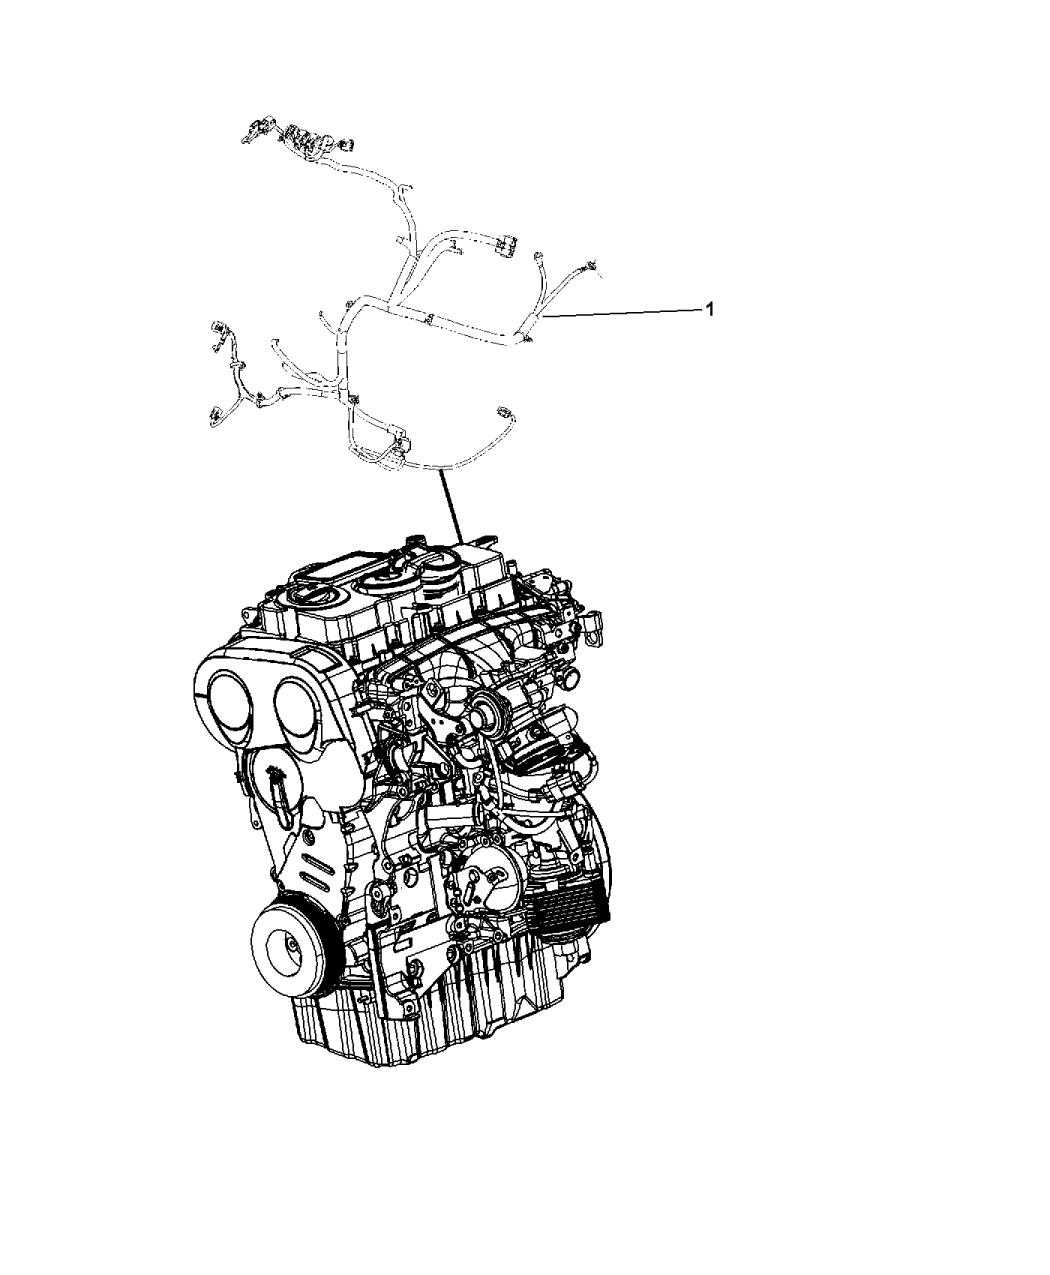 2014 Dodge Journey Wiring Powertrain Mopar Parts Giant Harness Thumbnail 2